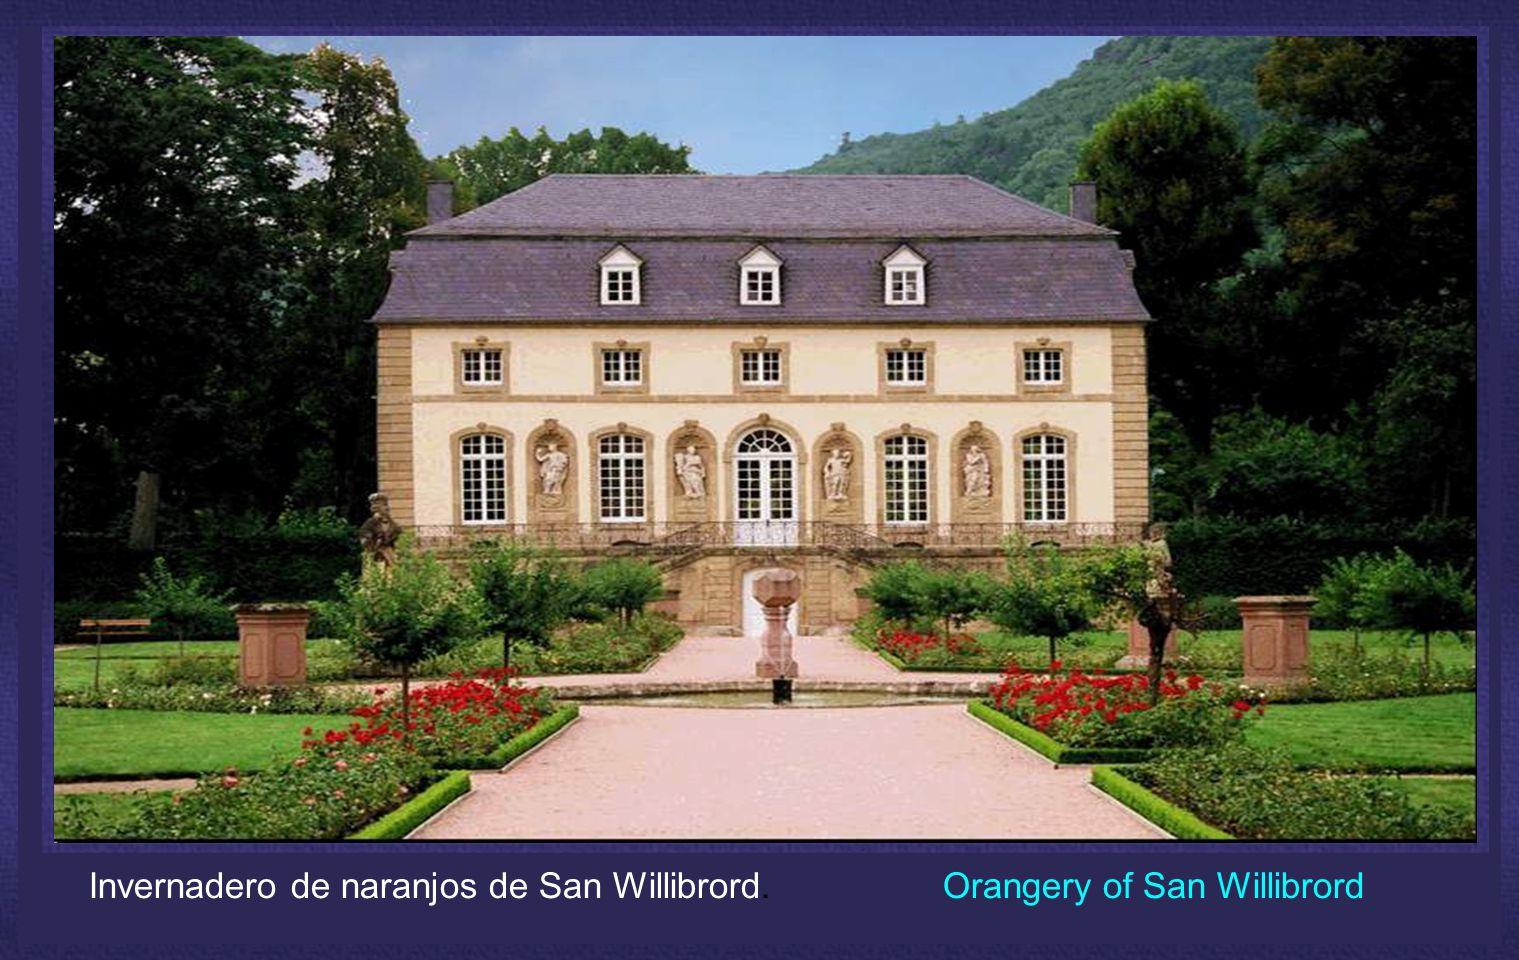 Invernadero de naranjos de San Willibrord. Orangery of San Willibrord